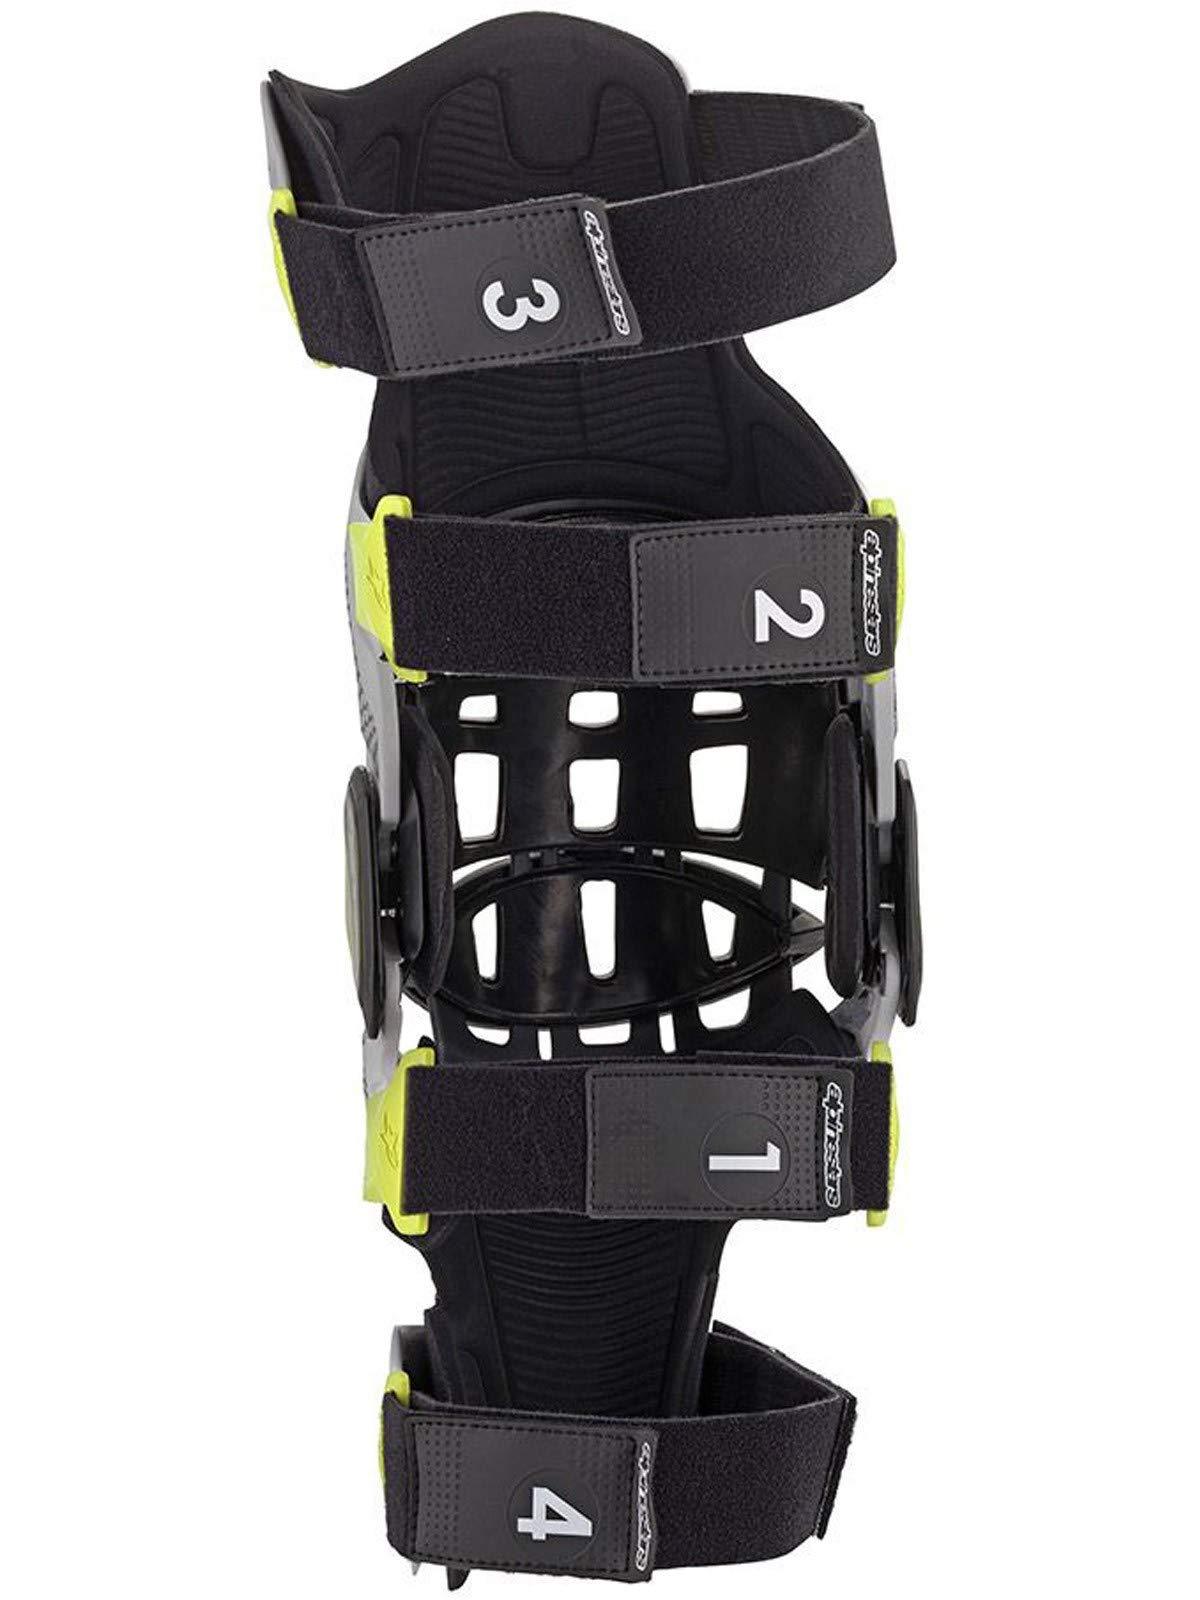 Bionic-7 Off-Road Motocross Knee Brace Set (Medium, Silver Yellow Fluo) by Alpinestars (Image #5)